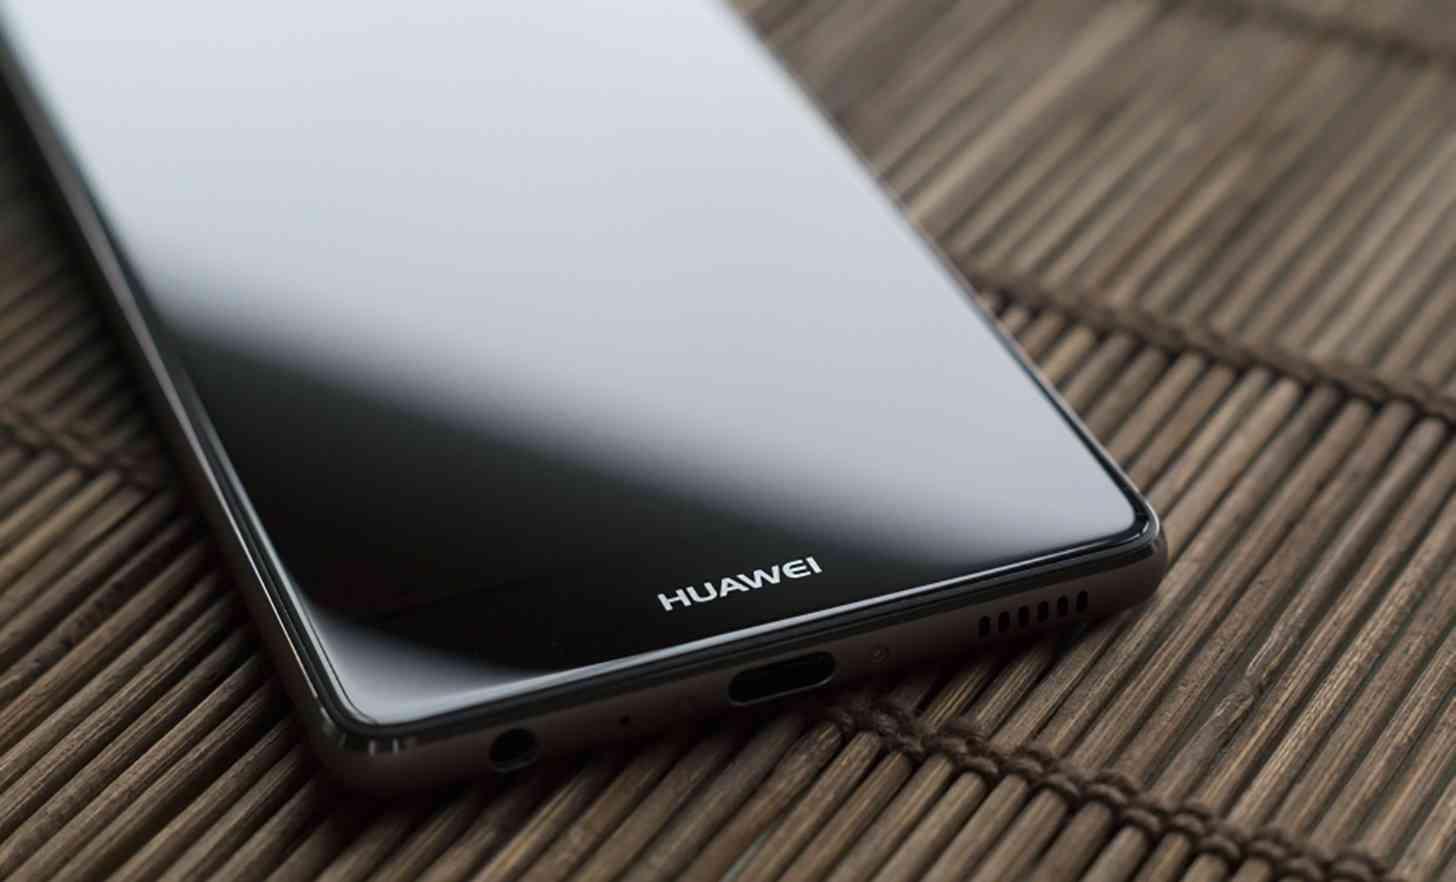 Facebook halts app preinstalls on Huawei phones, Google says ban could increase security risks